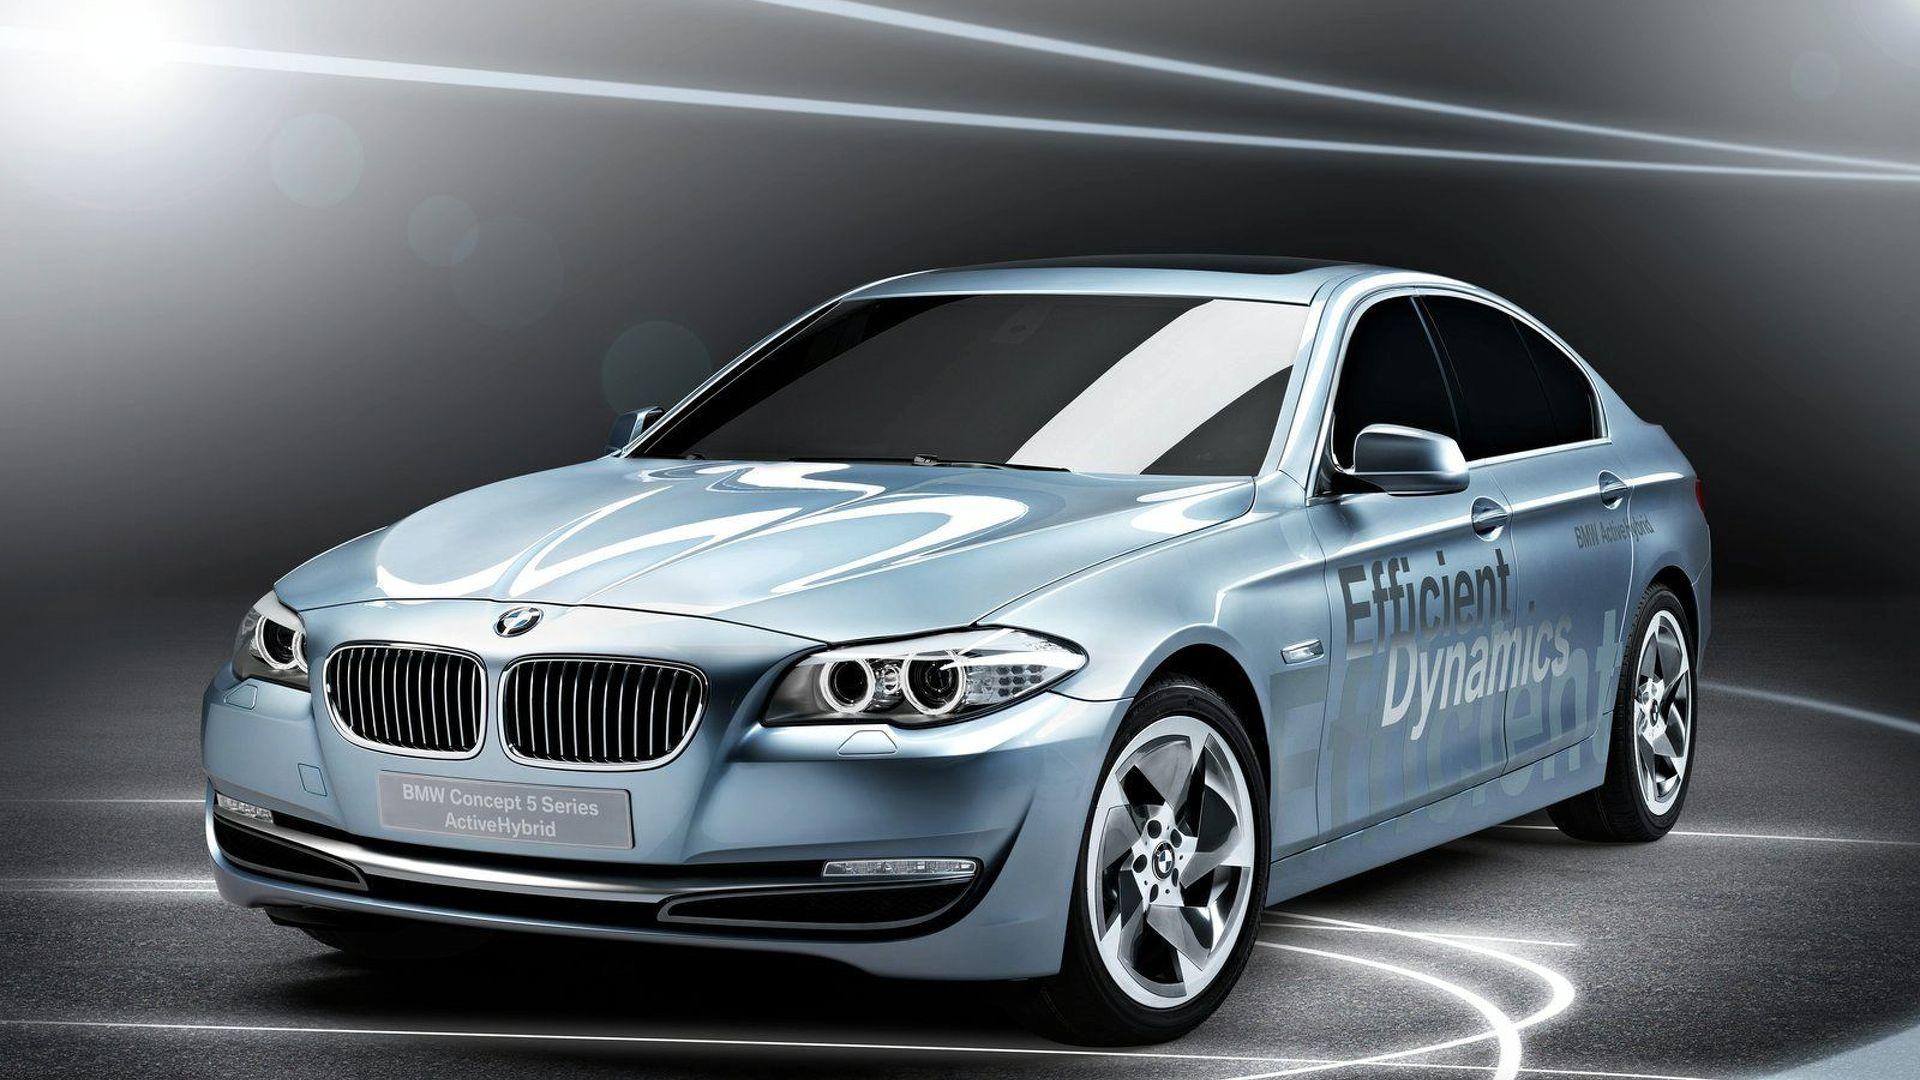 BMW 5-Series hybrid confirmed for 2011, 3-Series hybrid in development